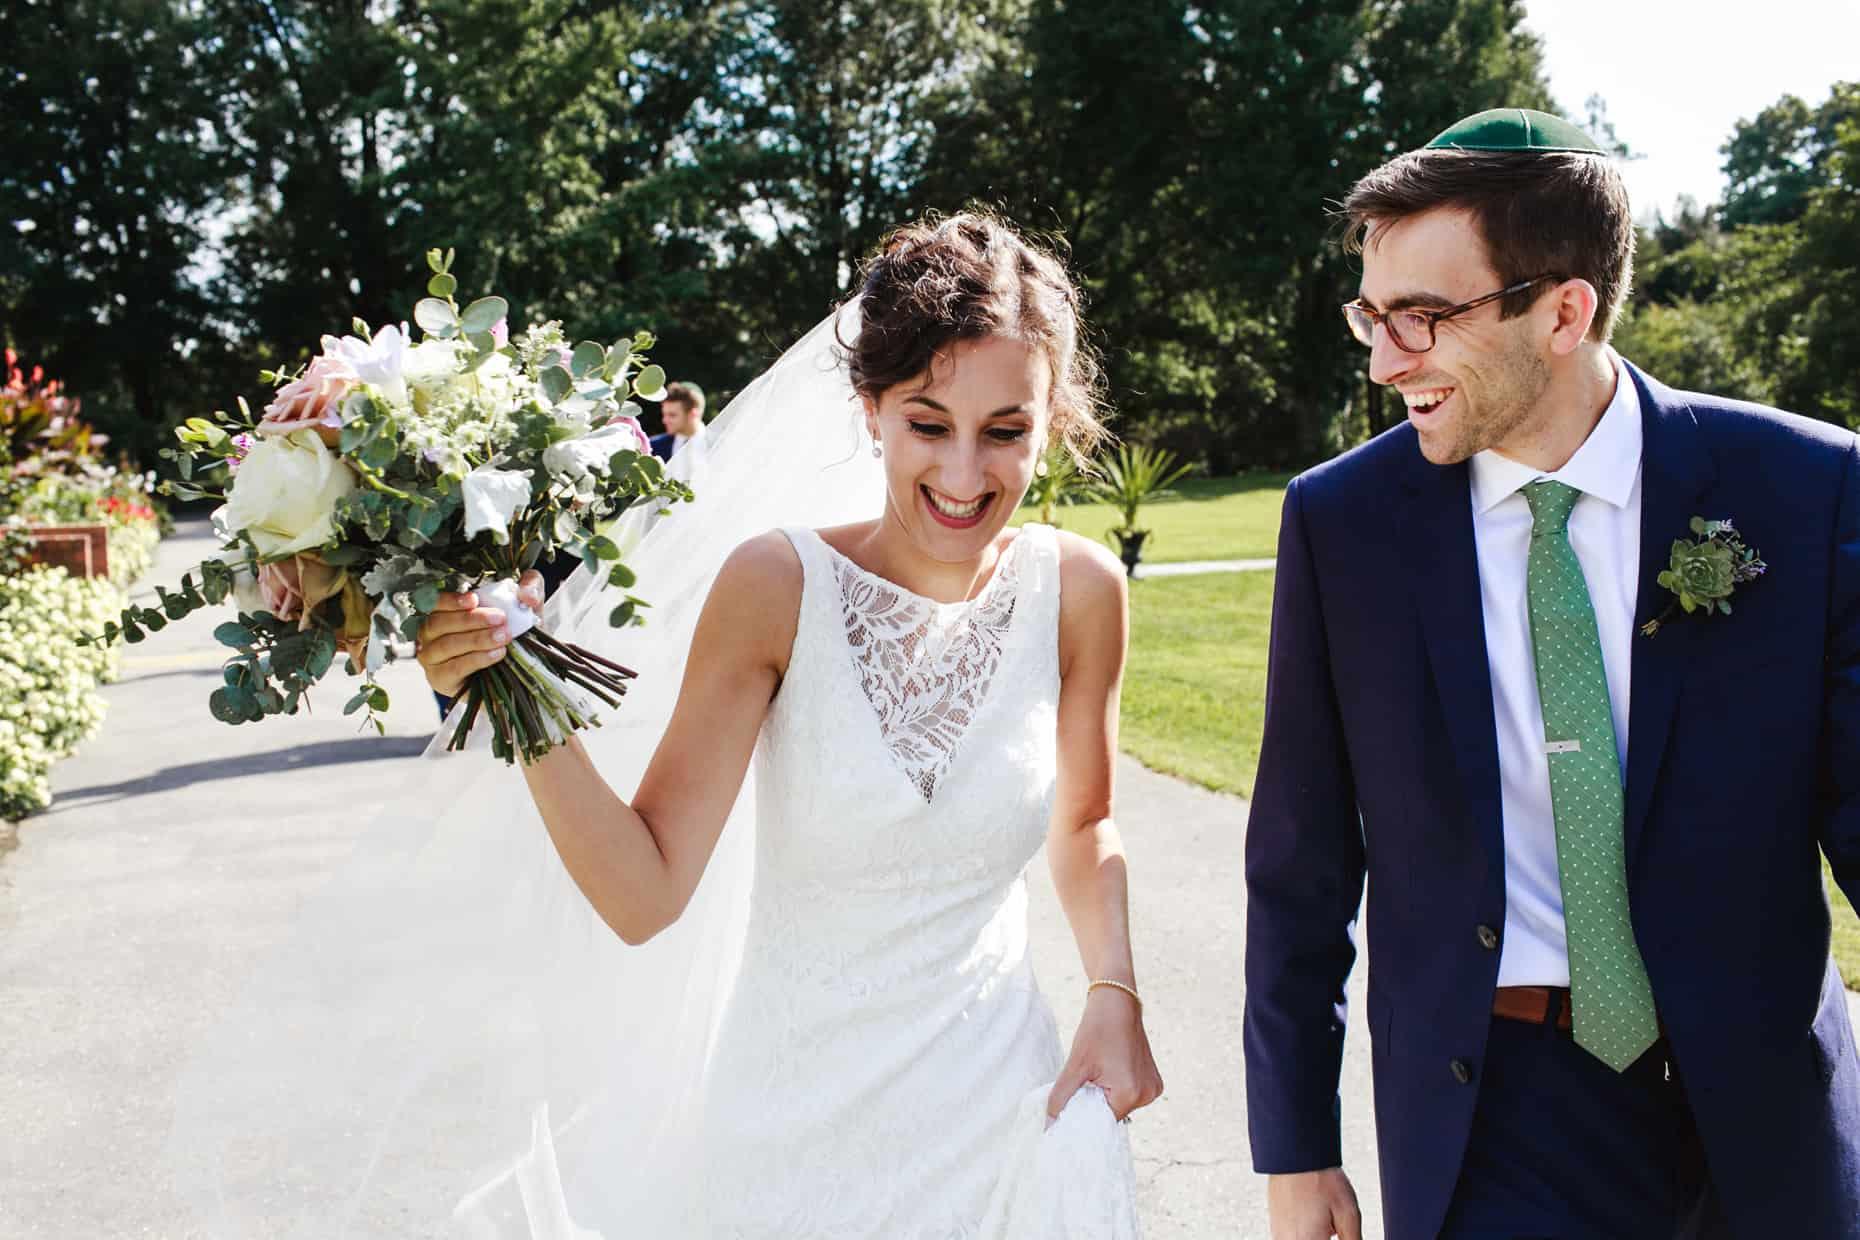 Fairmount Park Horticultural Center Wedding Reception